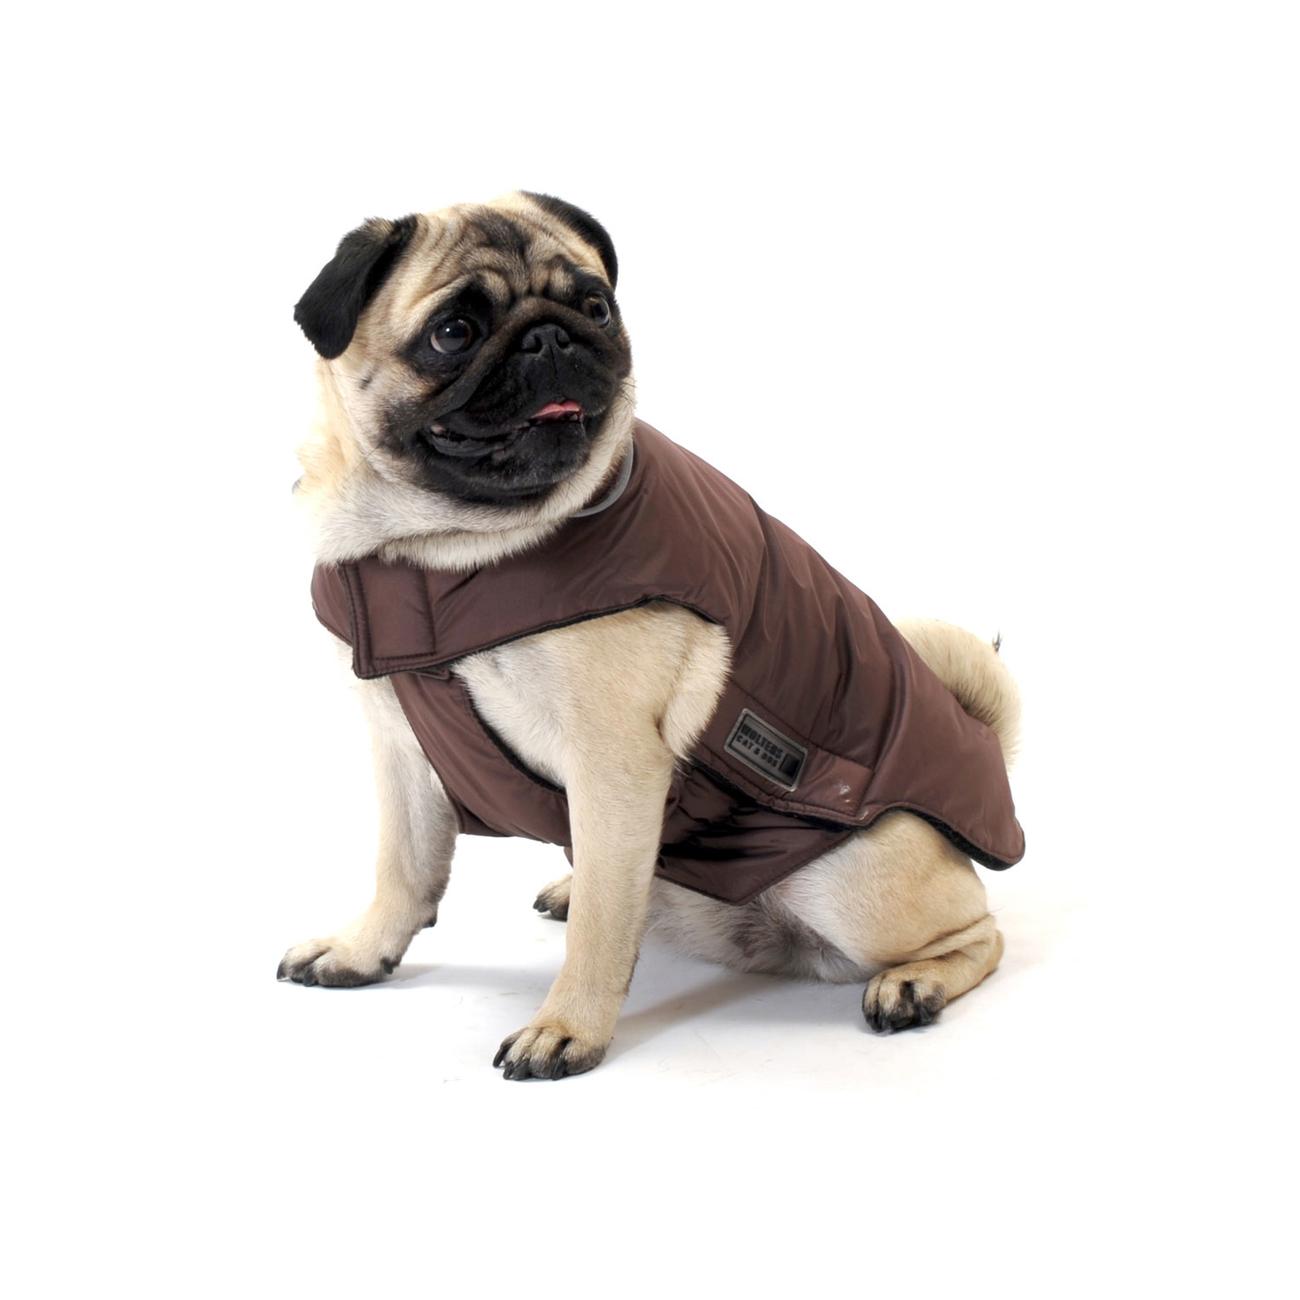 Wolters Hundemantel Outdoorjacke Jack für Mops & Co, Bild 3